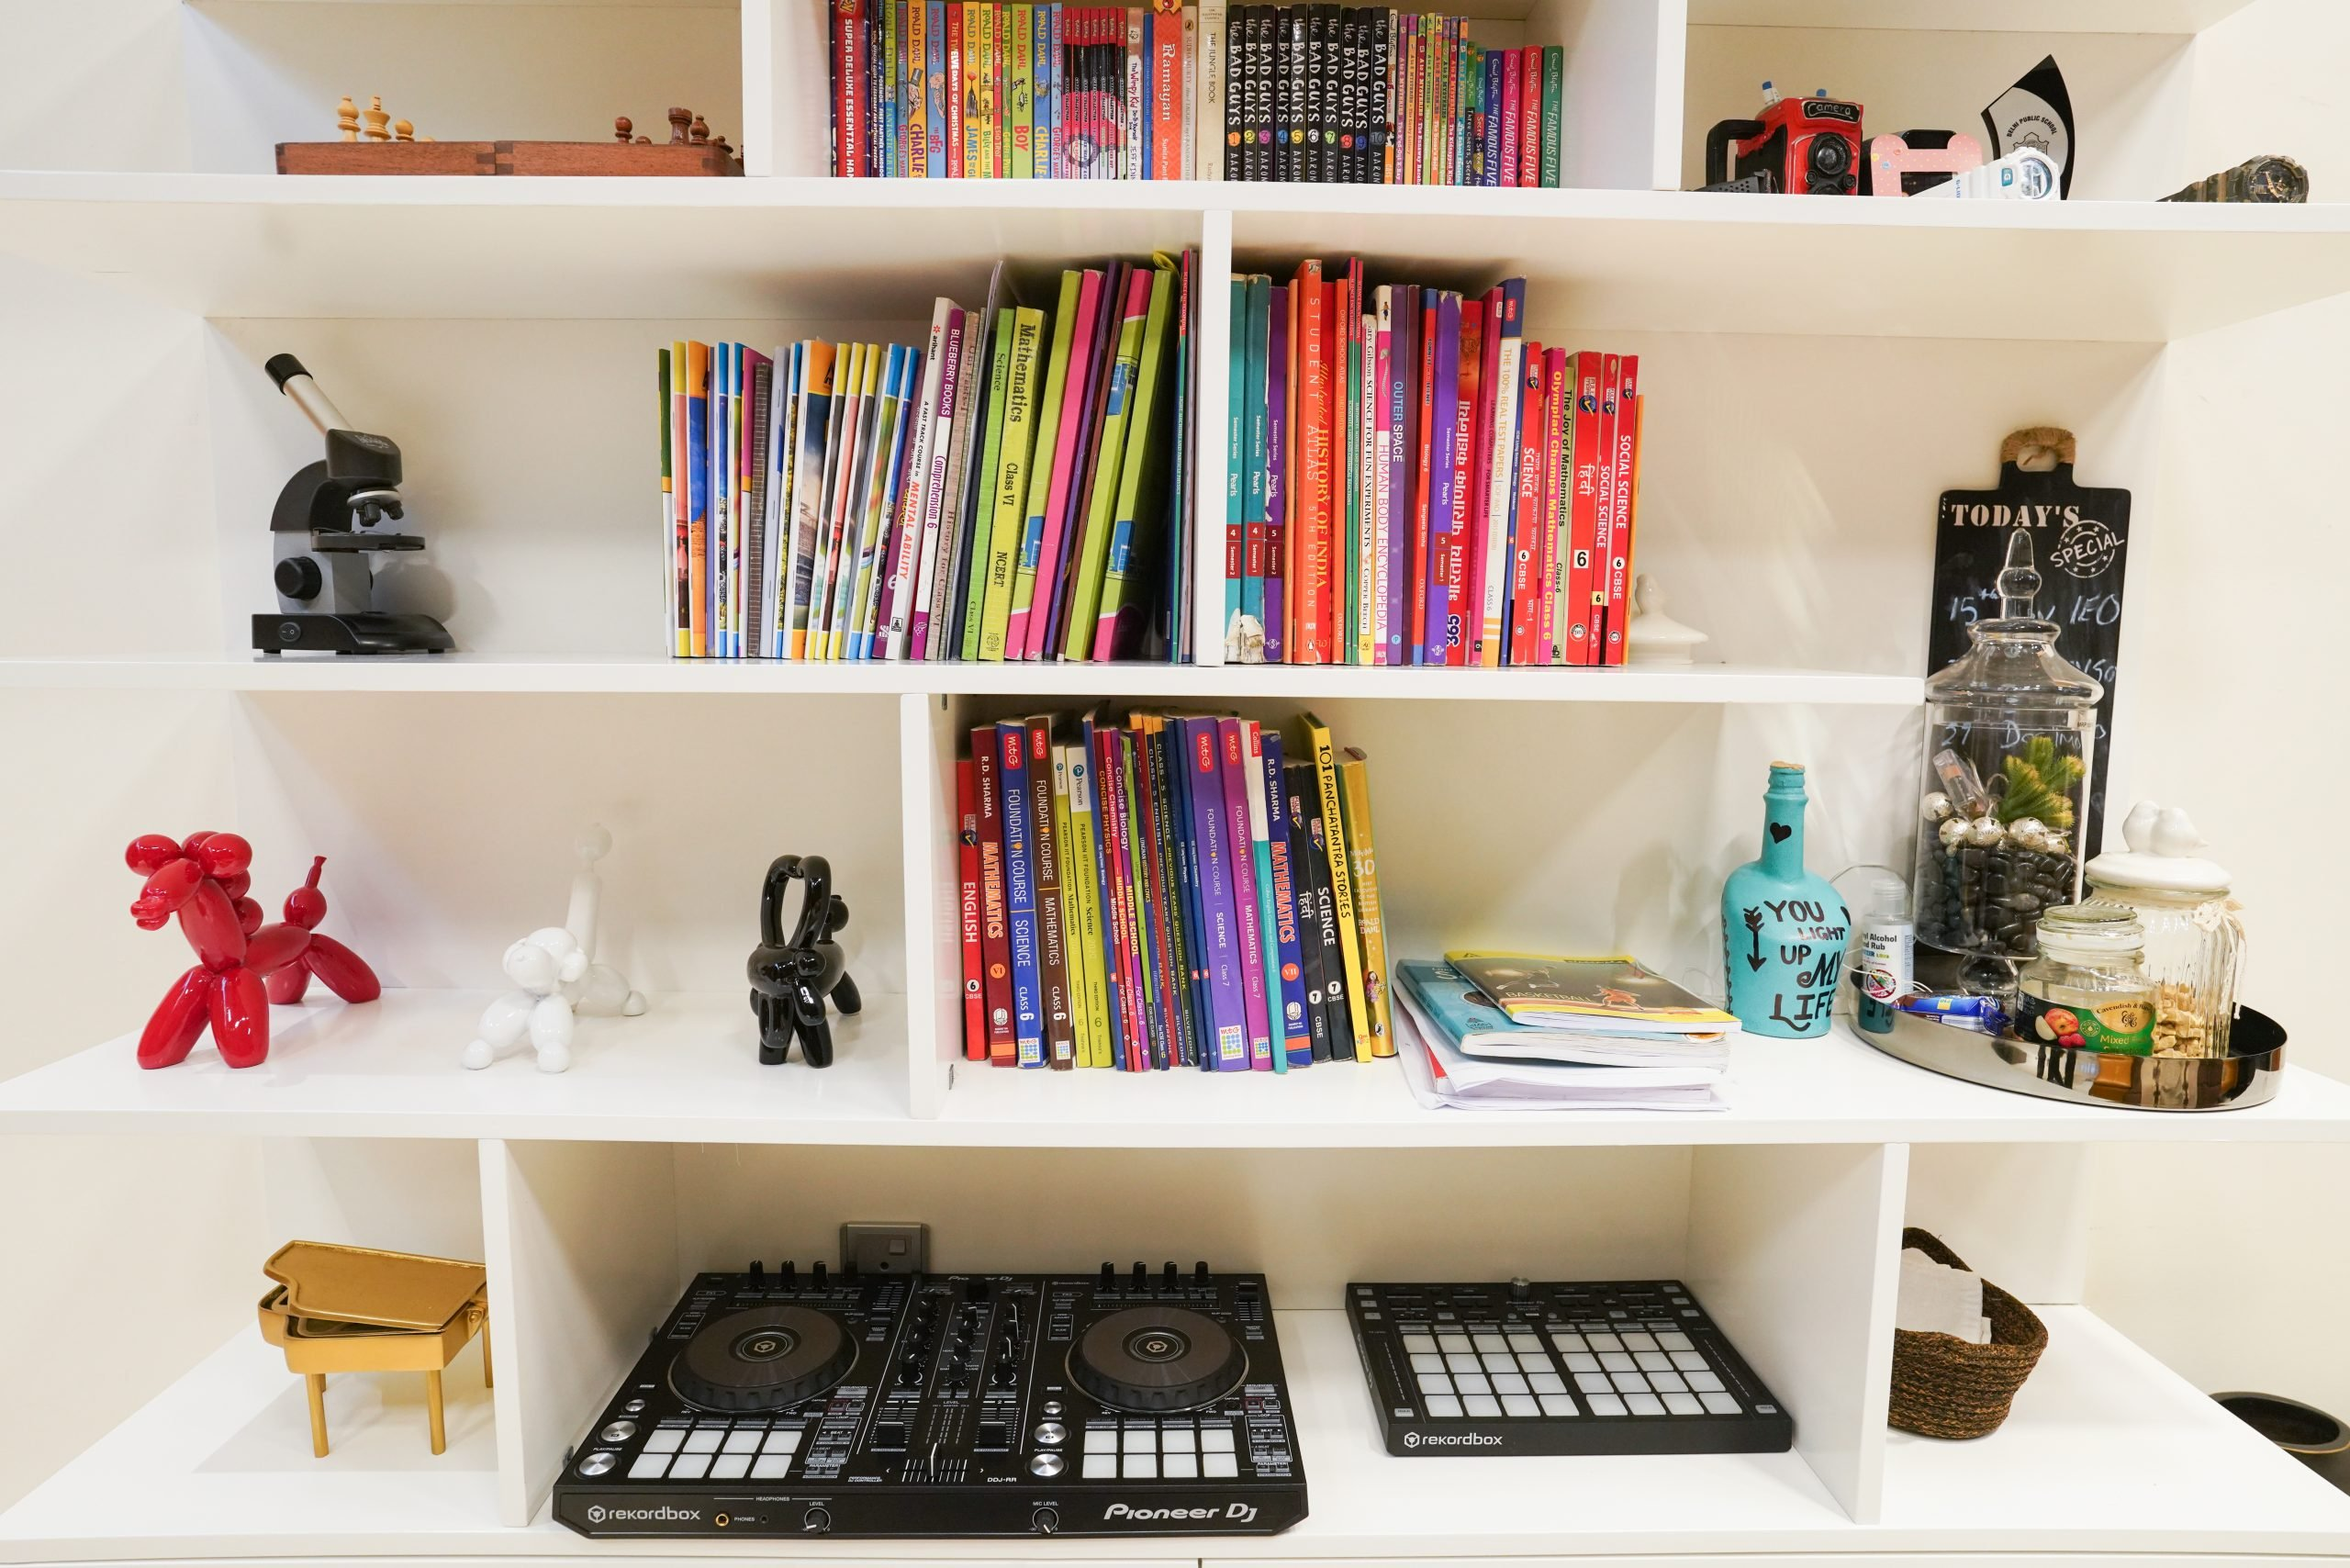 Books on wall shelves